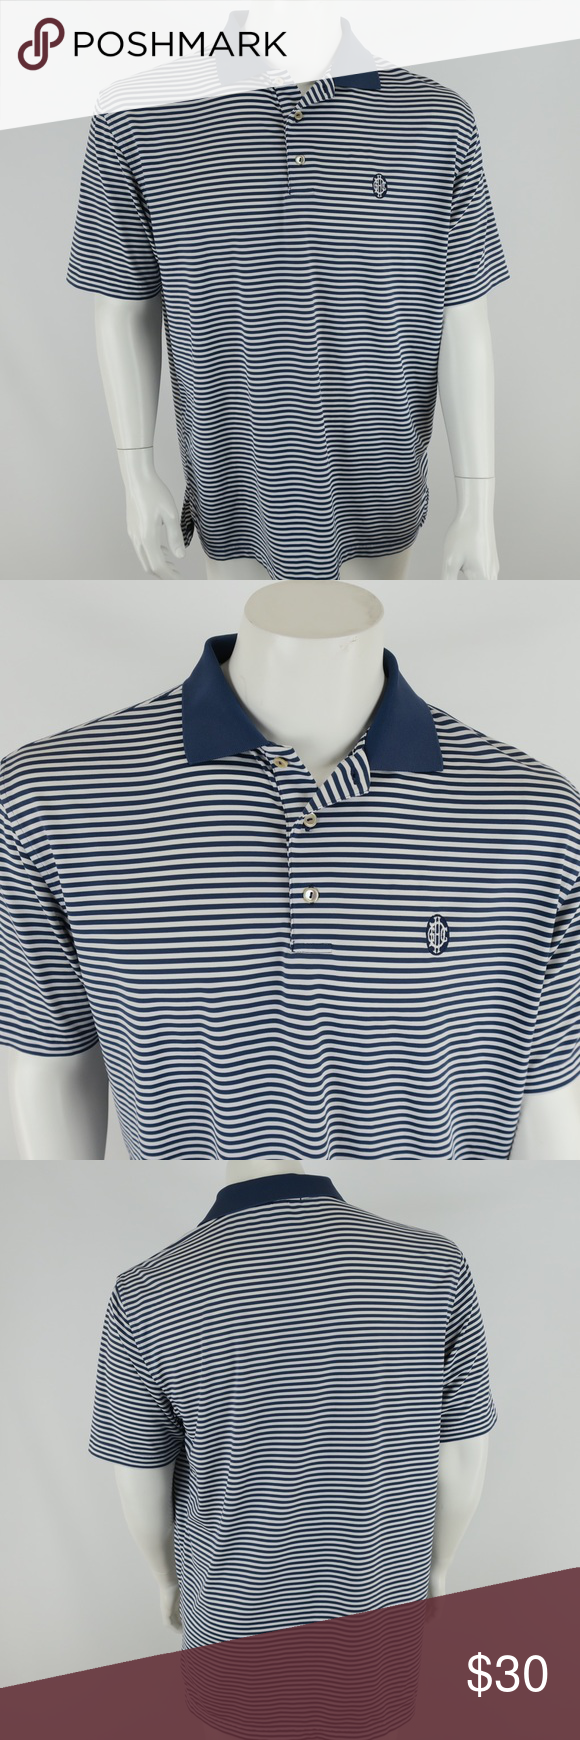 Peter Millar Golf Polo Shirt Peter Millar Golf Polo Shirt